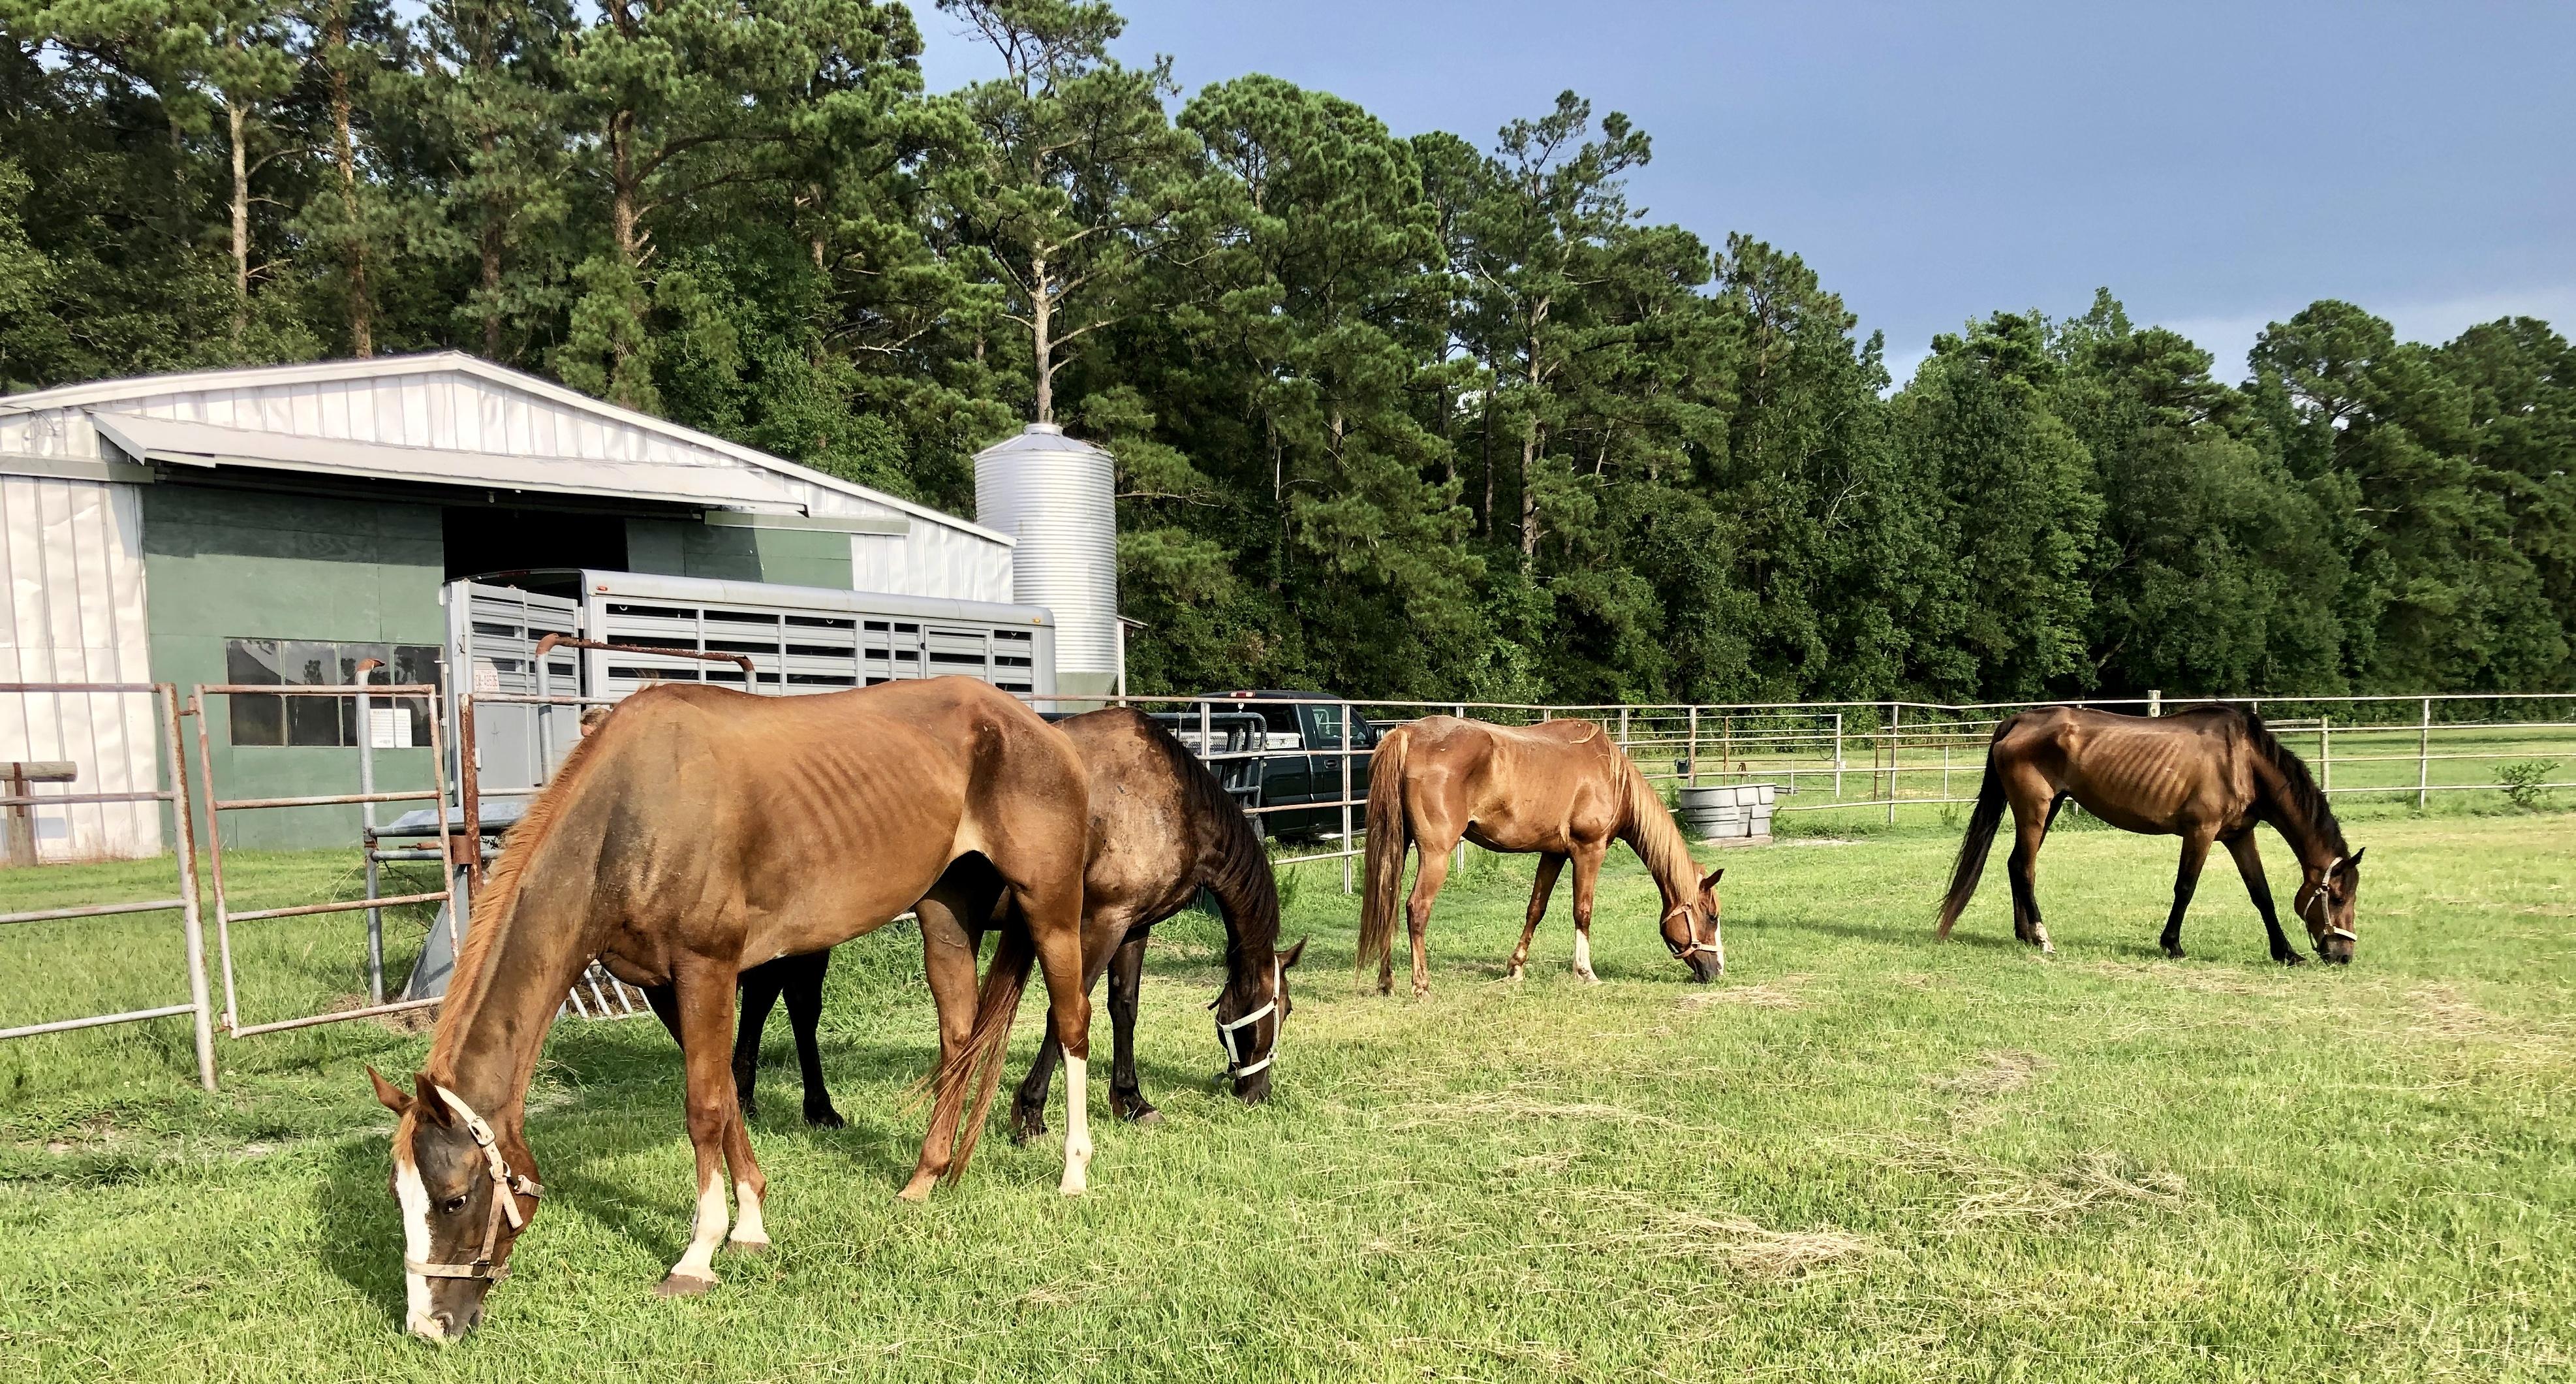 Horse rescue wilmington nc